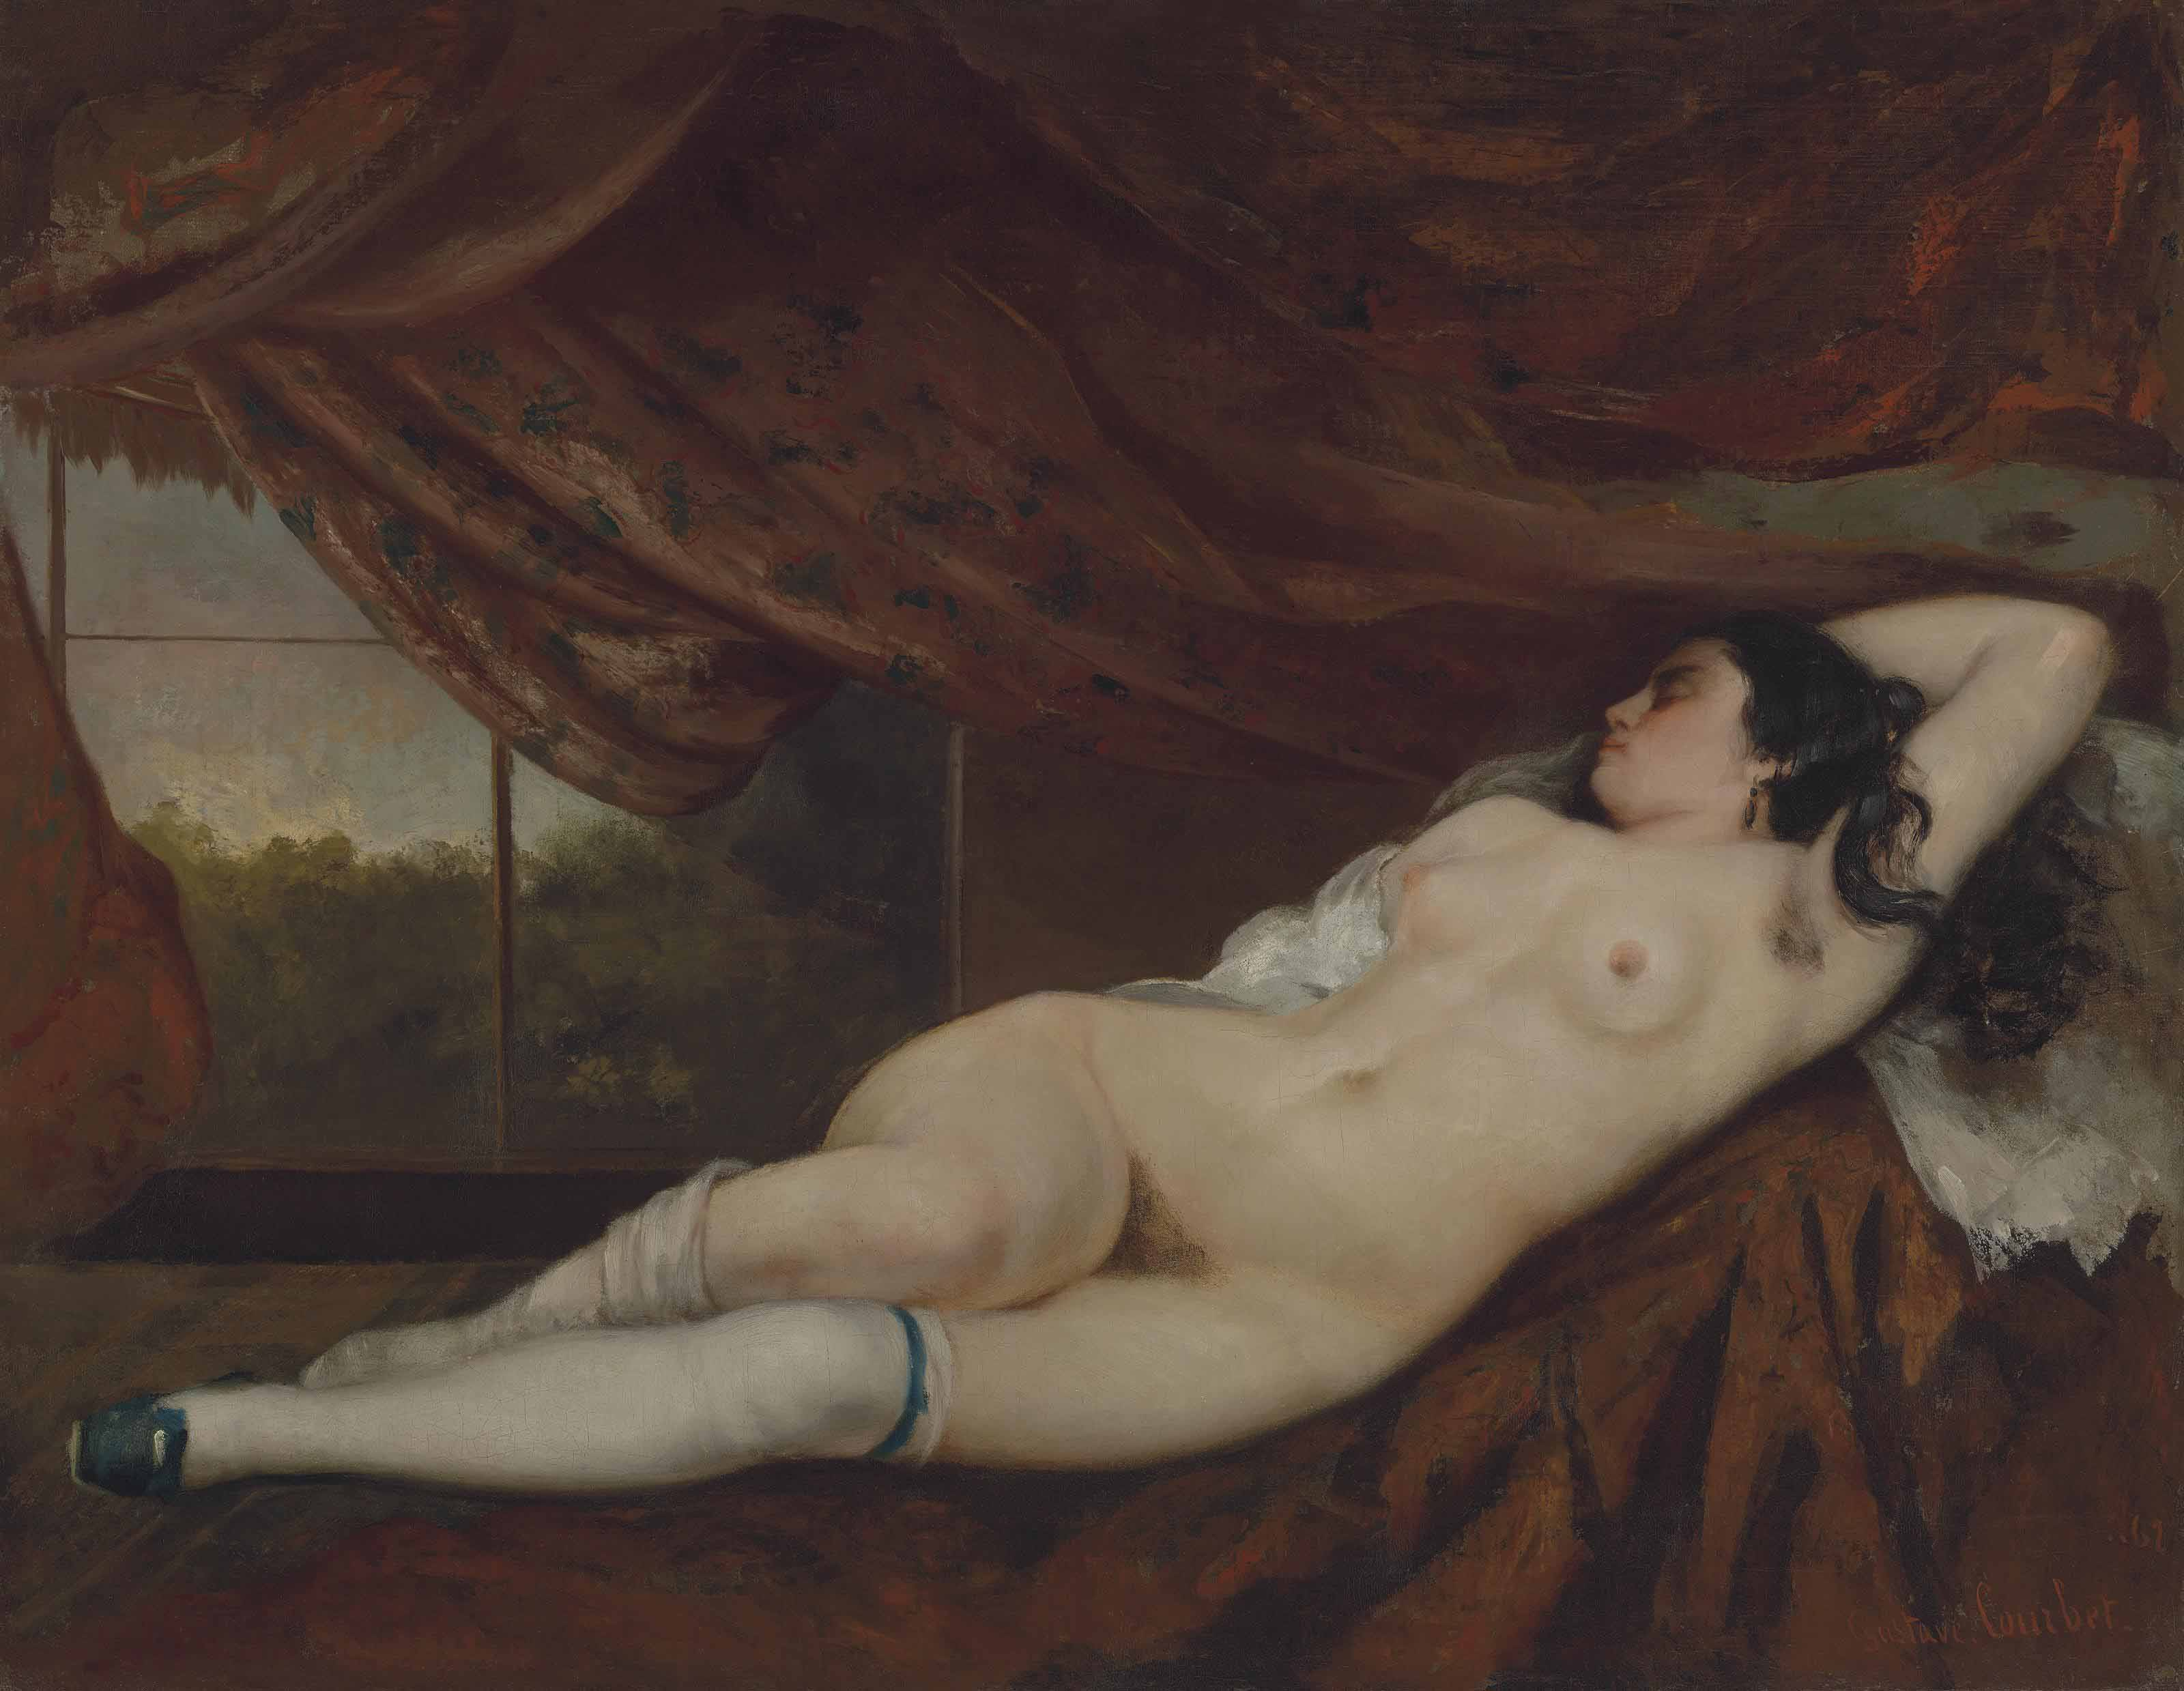 Nude painting video ebony durbin sisters